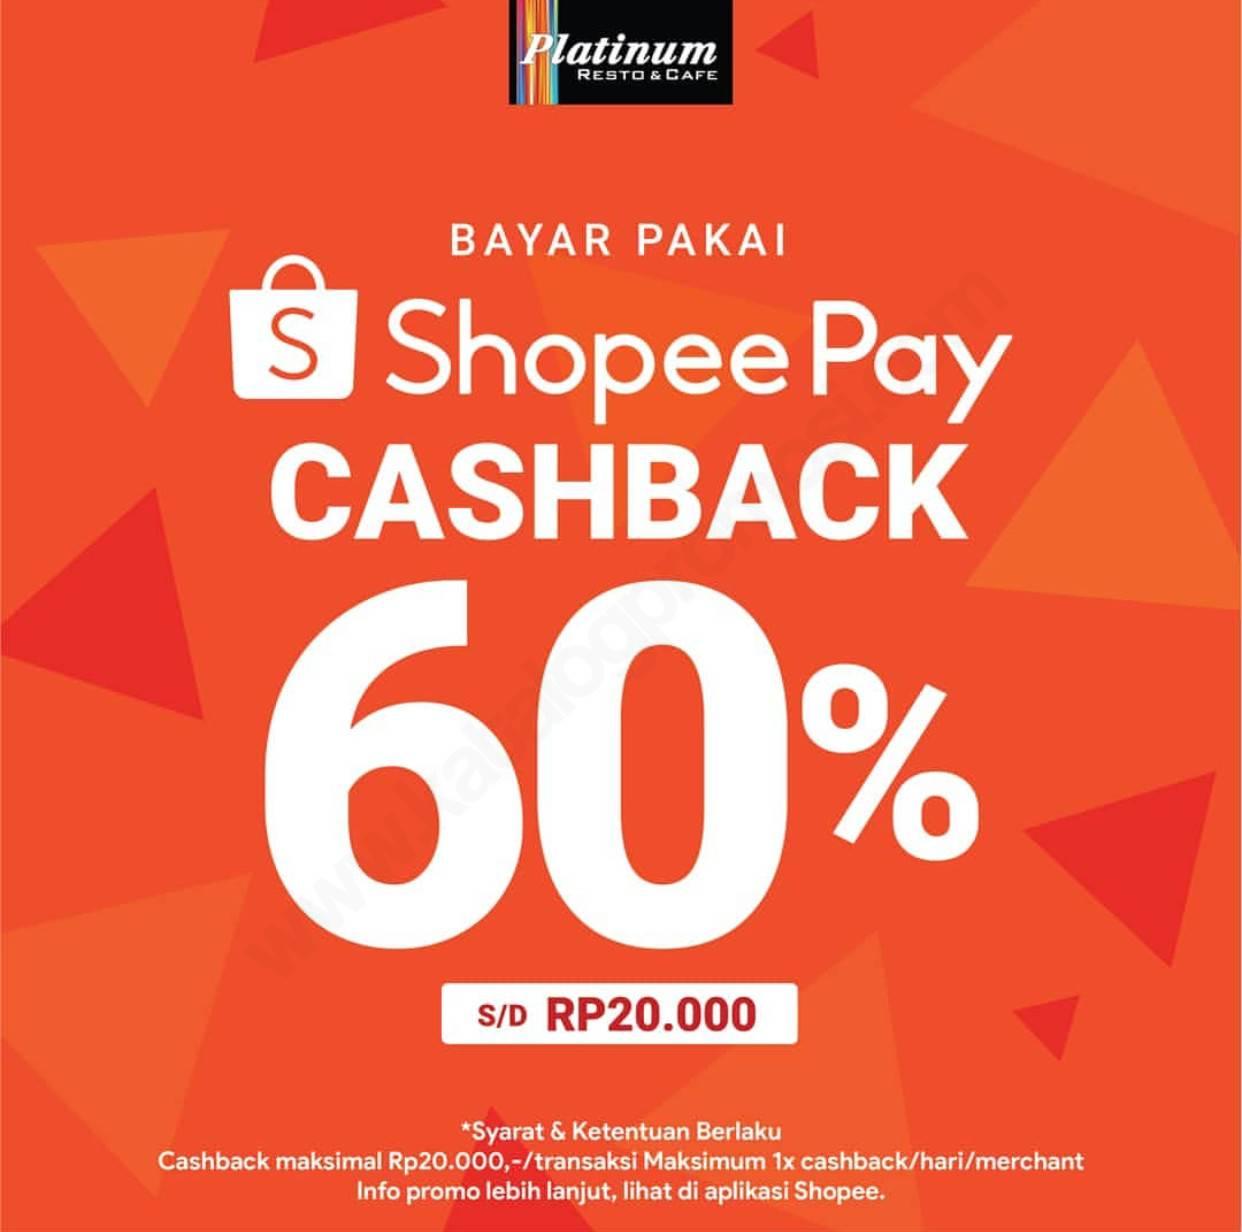 Platinum Resto Cashback 60% dengan ShopeePay